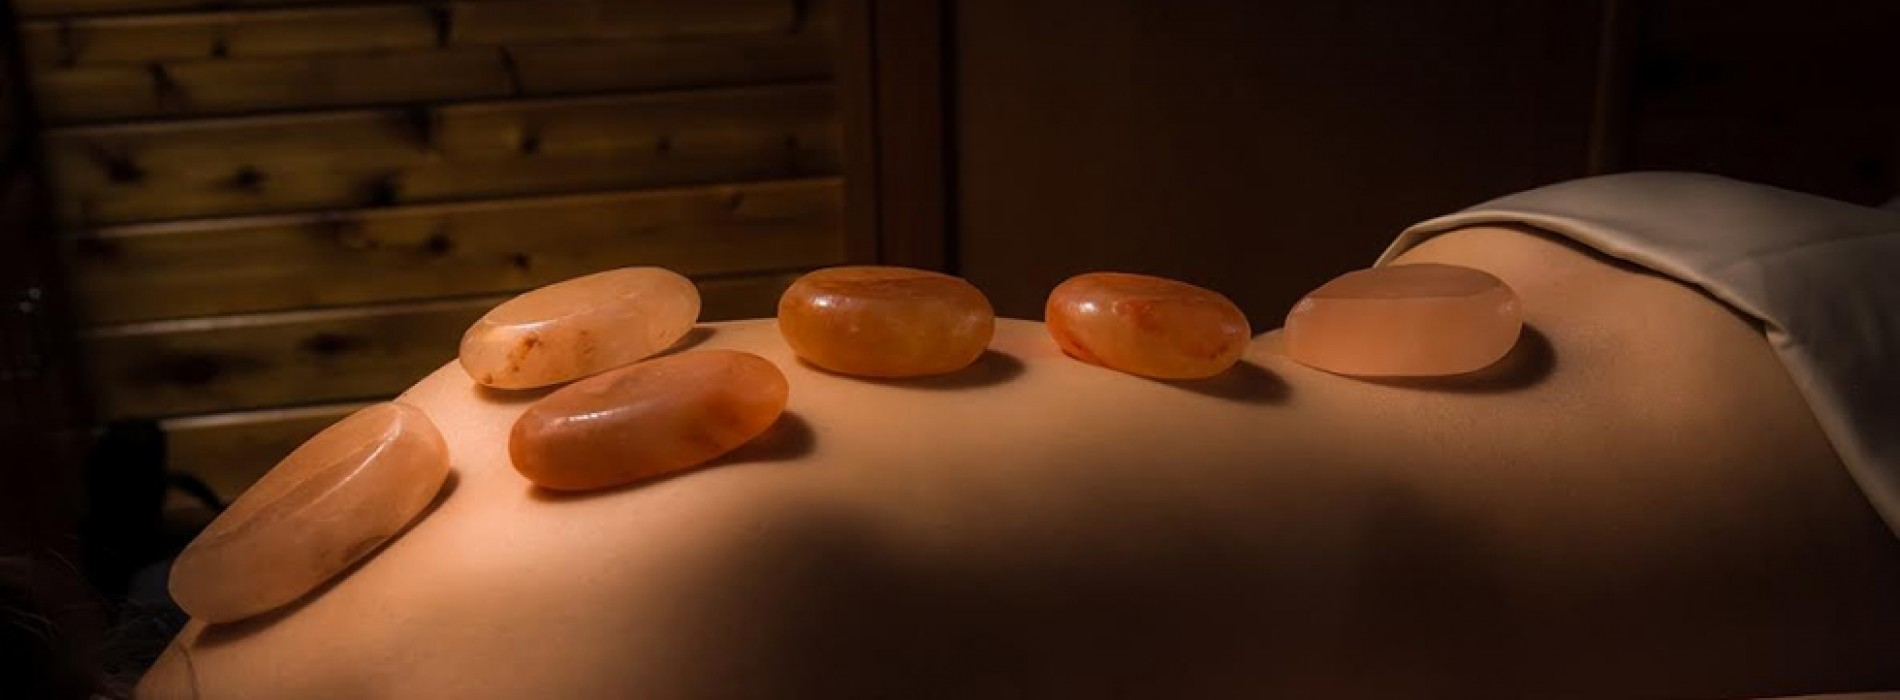 Conrad Macao Bodhi Spa debuts Asia's First Himalayan Salt Stone Massage treatment